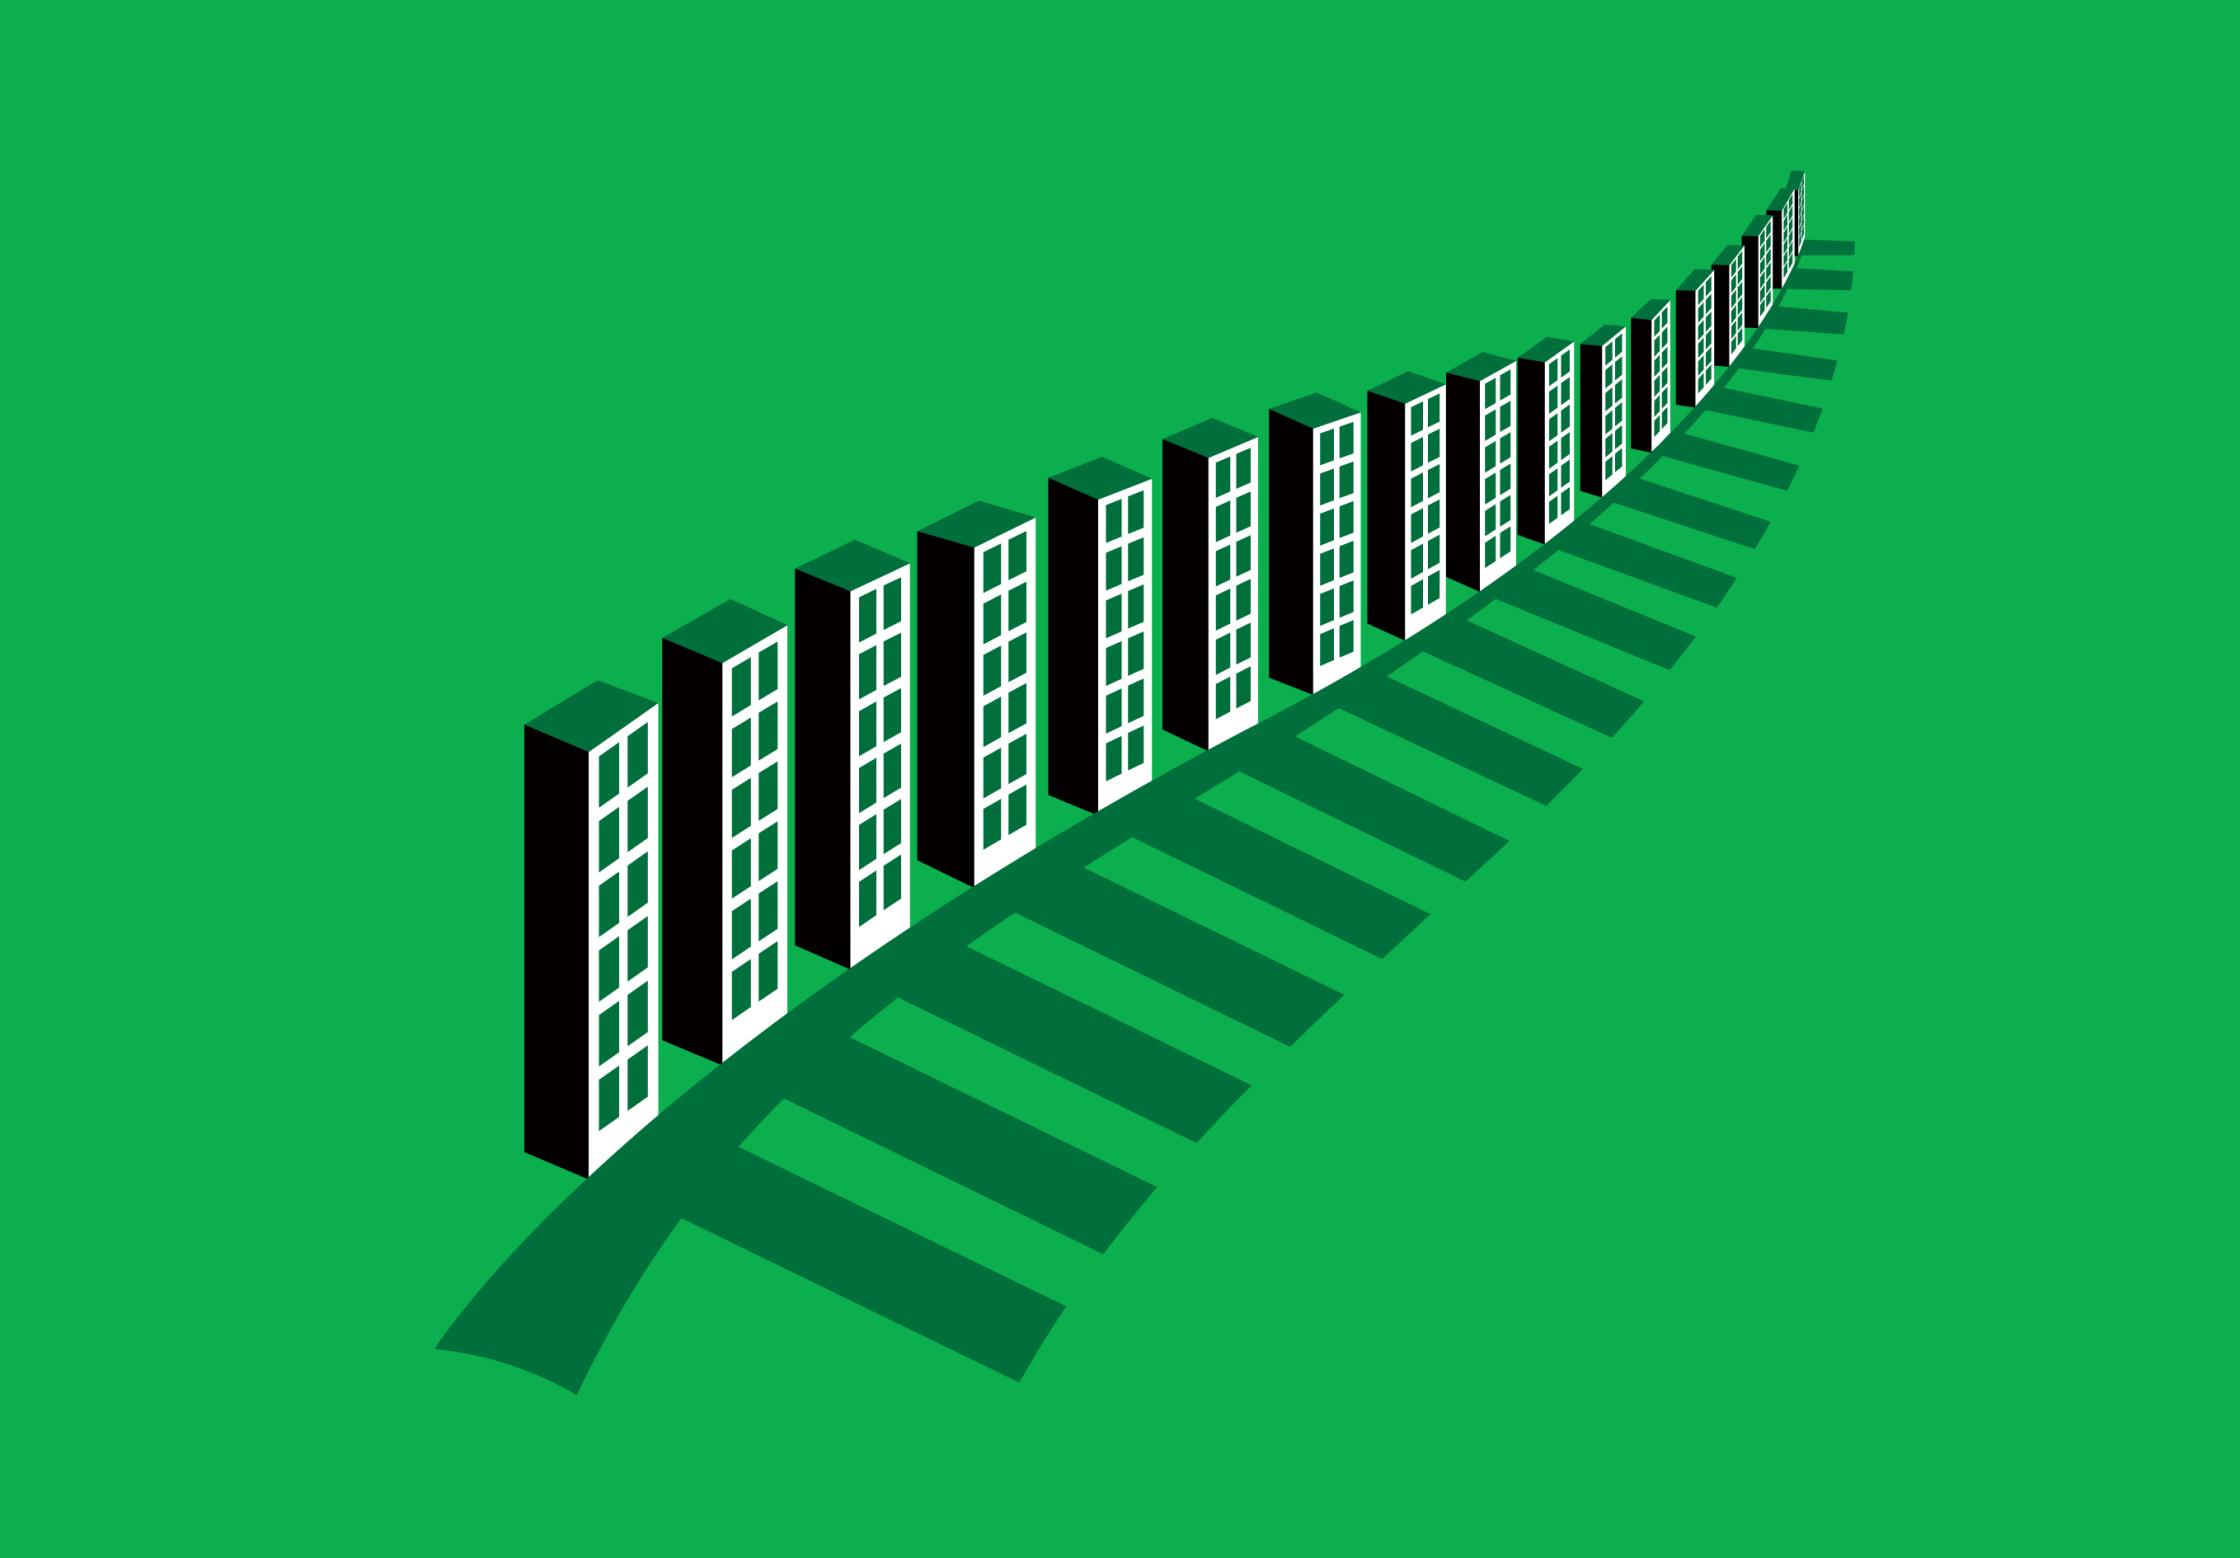 Green Cities / Fidelity